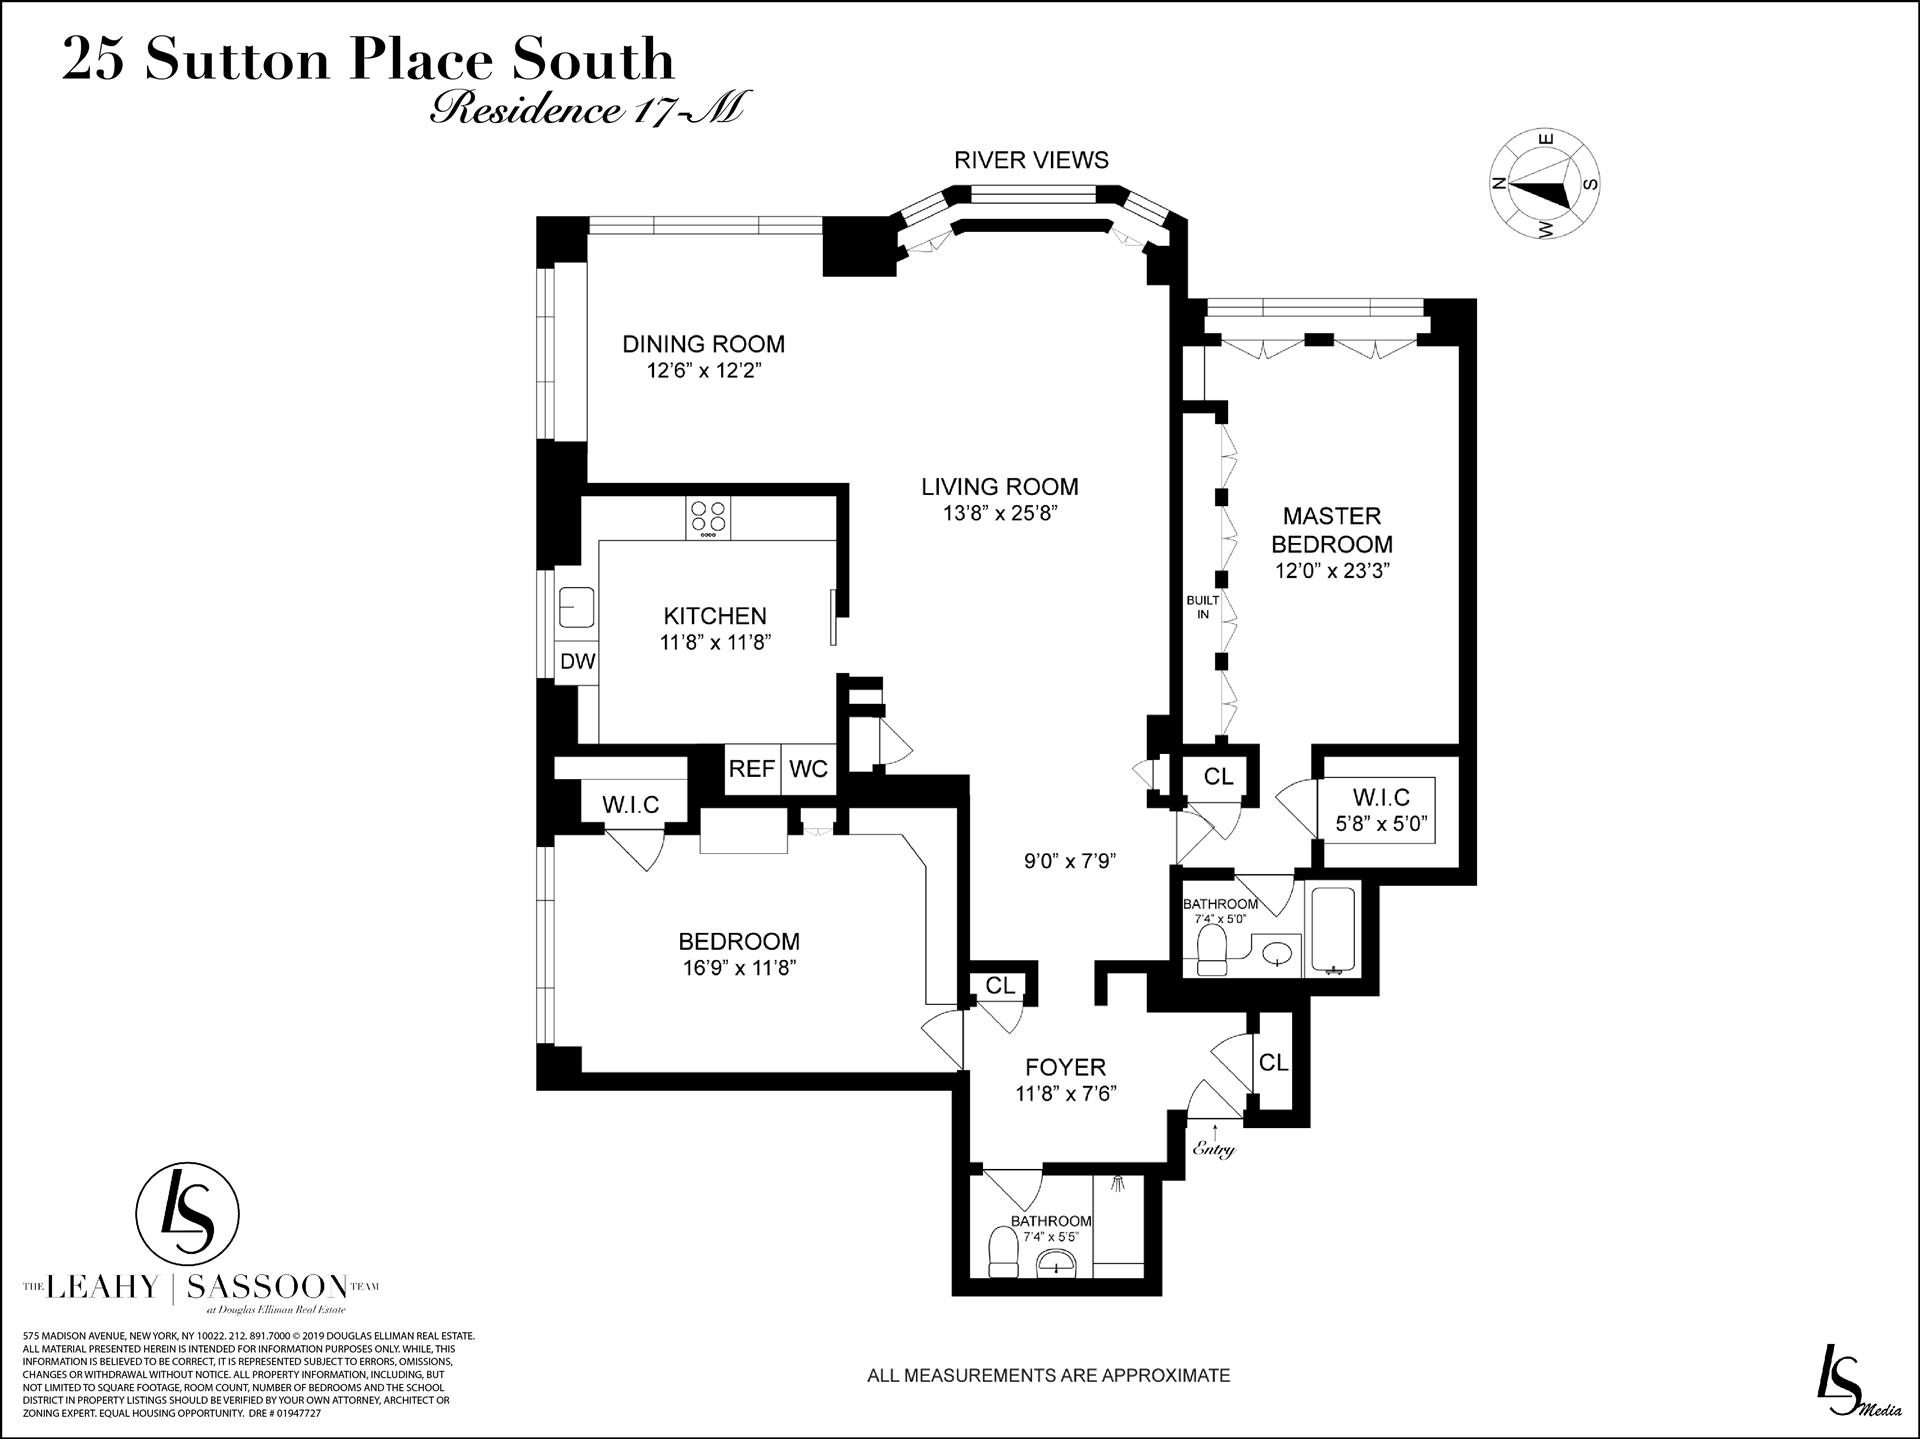 Floor plan of 25 Sutton Pl South, 17M - Sutton Area, New York